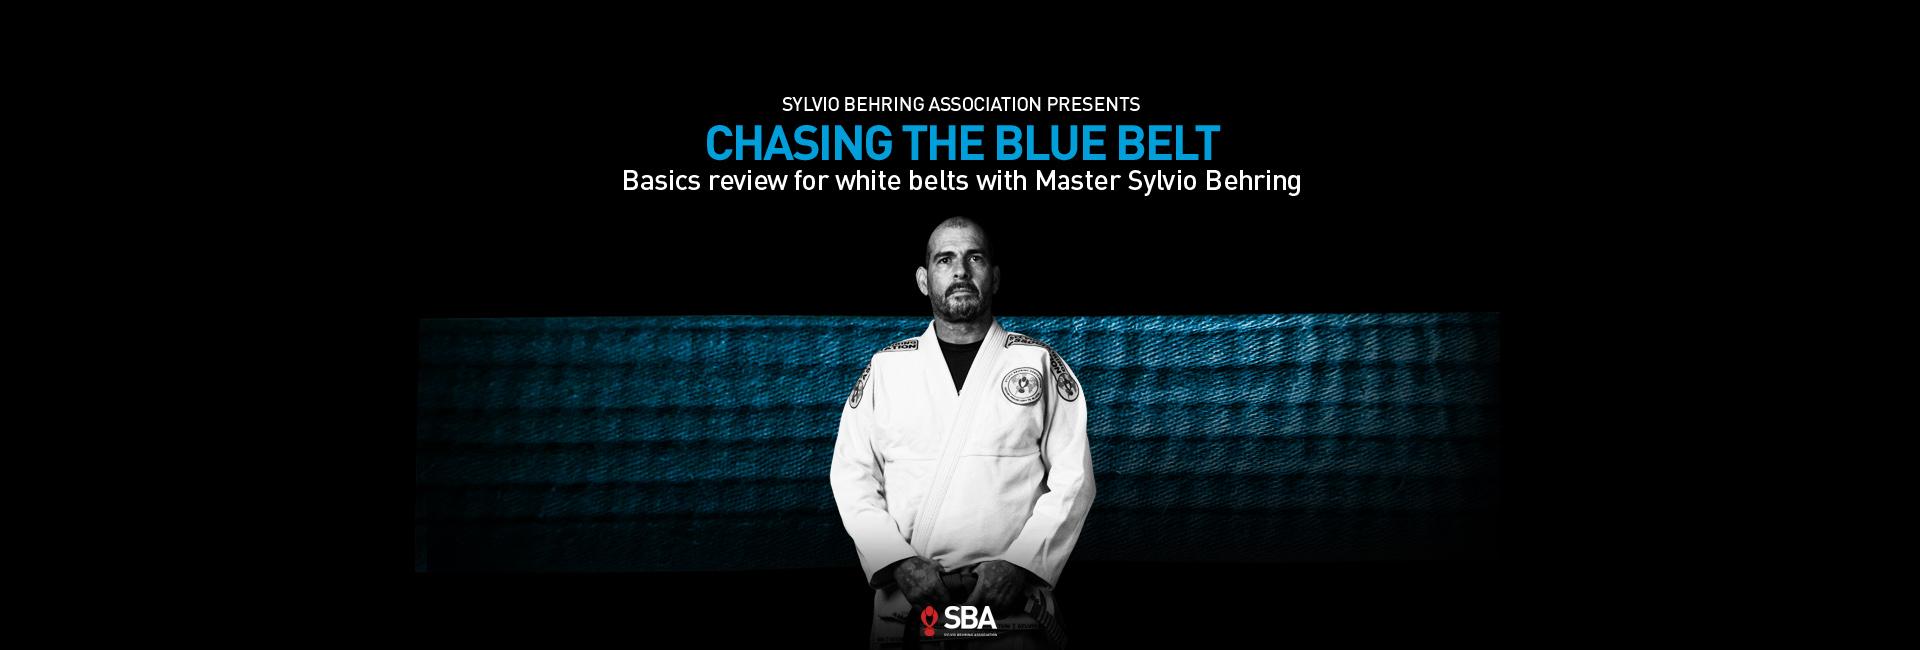 Sylvio-Behring-Association-Chasing-Blue-Belt